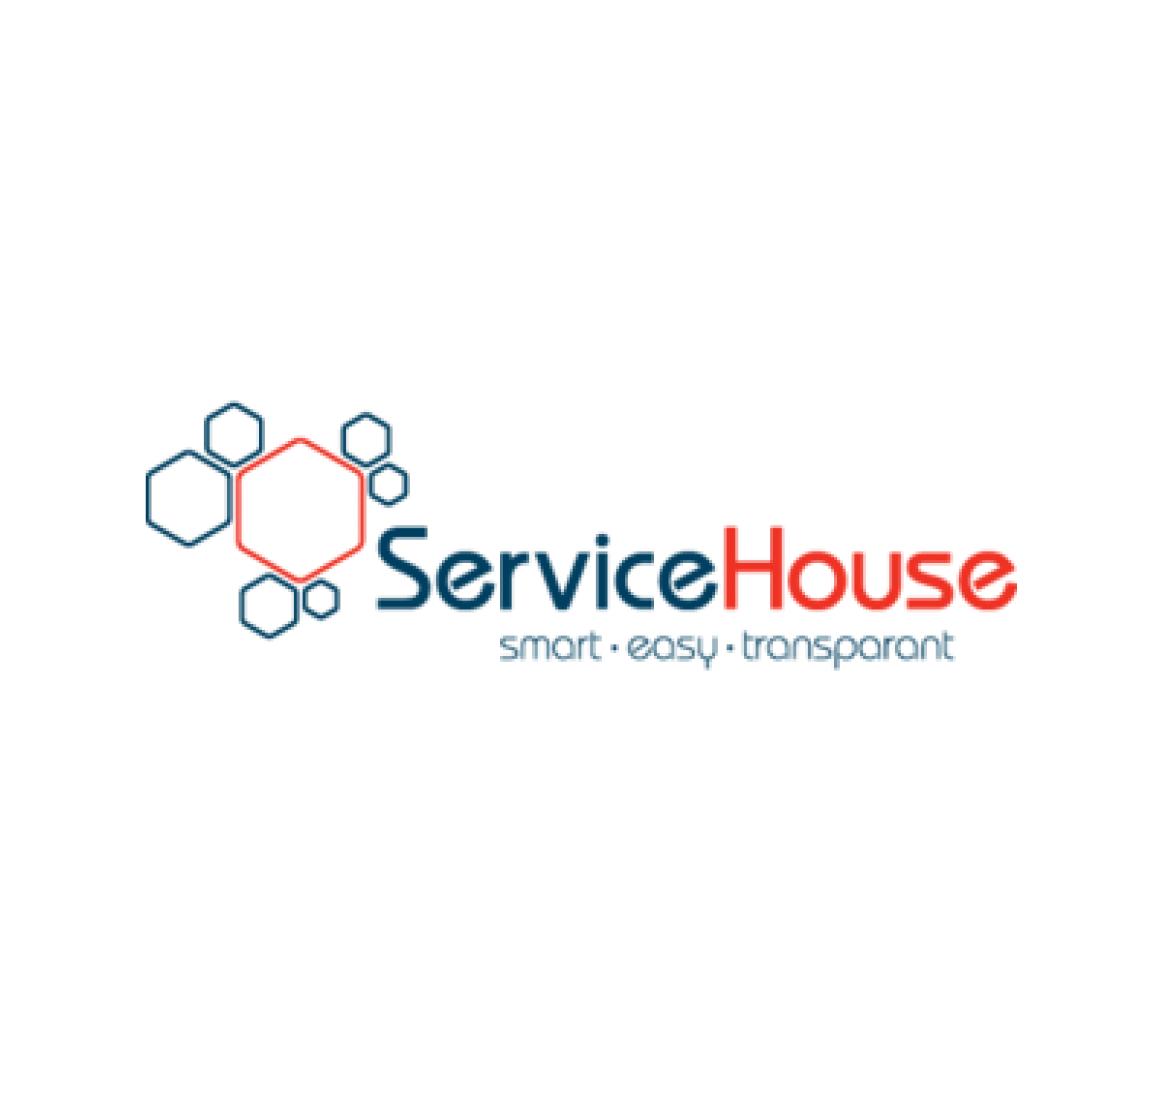 https://f.hubspotusercontent40.net/hubfs/7569749/servicehouse_hero@2x.png  style=